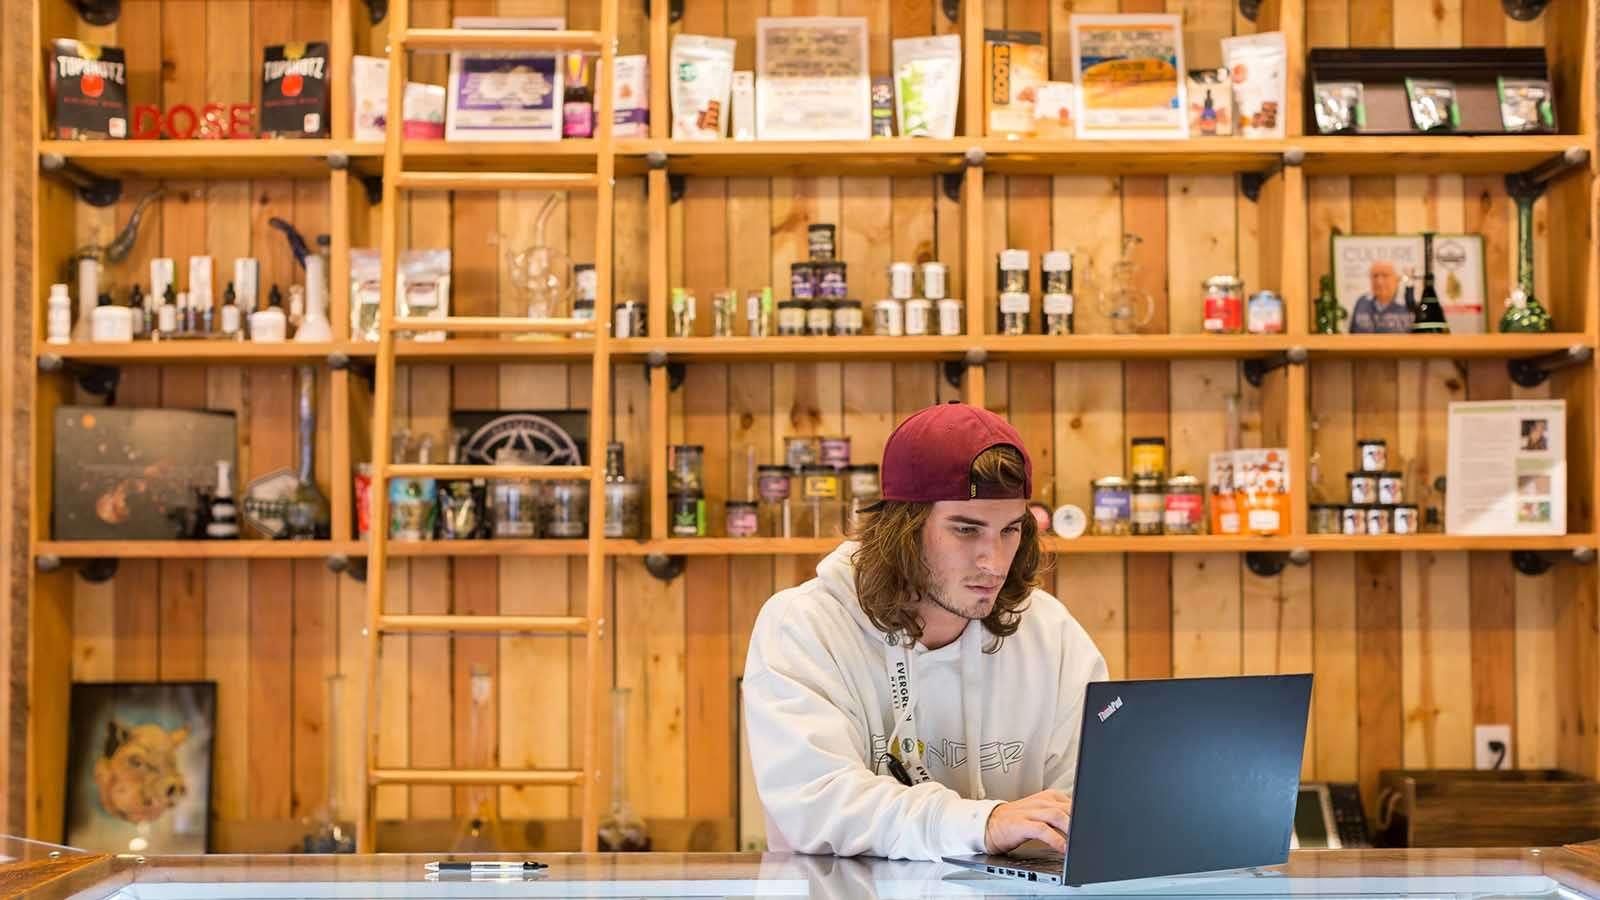 Cova-Merchandise-Cannabis-Retail-Operation-420